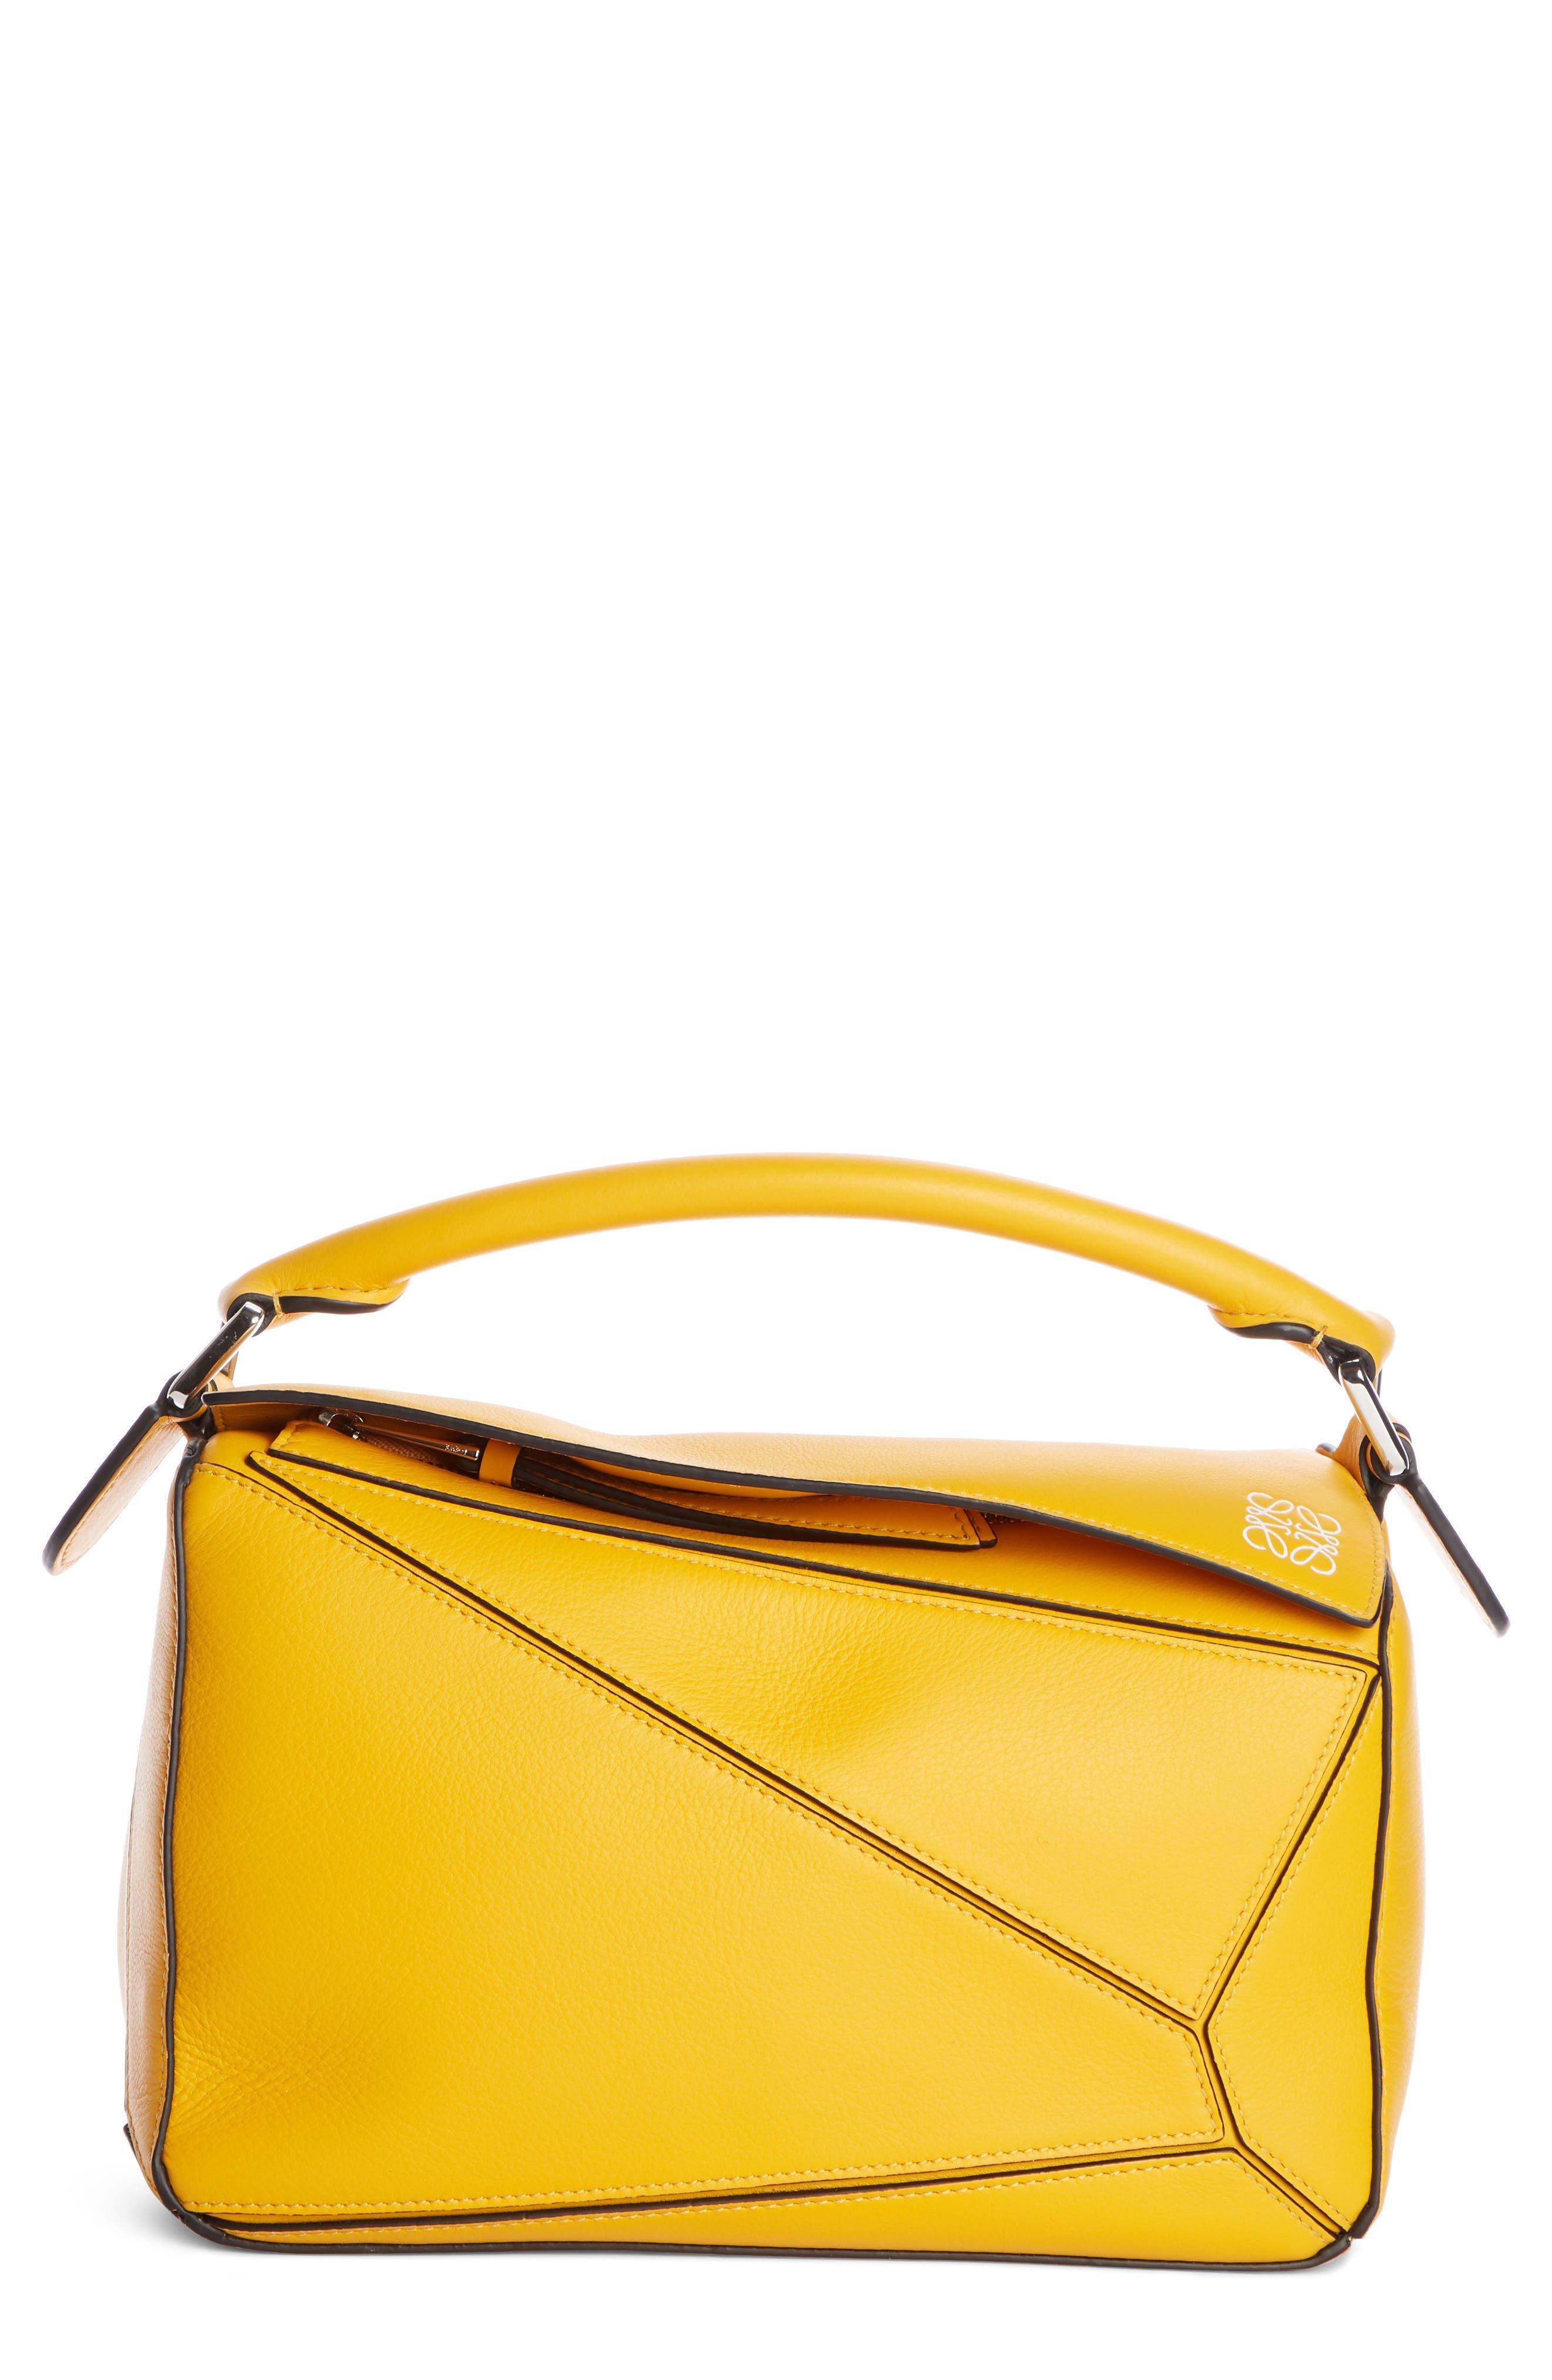 LOEWE Small Puzzle Shoulder Bag, Main, color, YELLOW MANGO